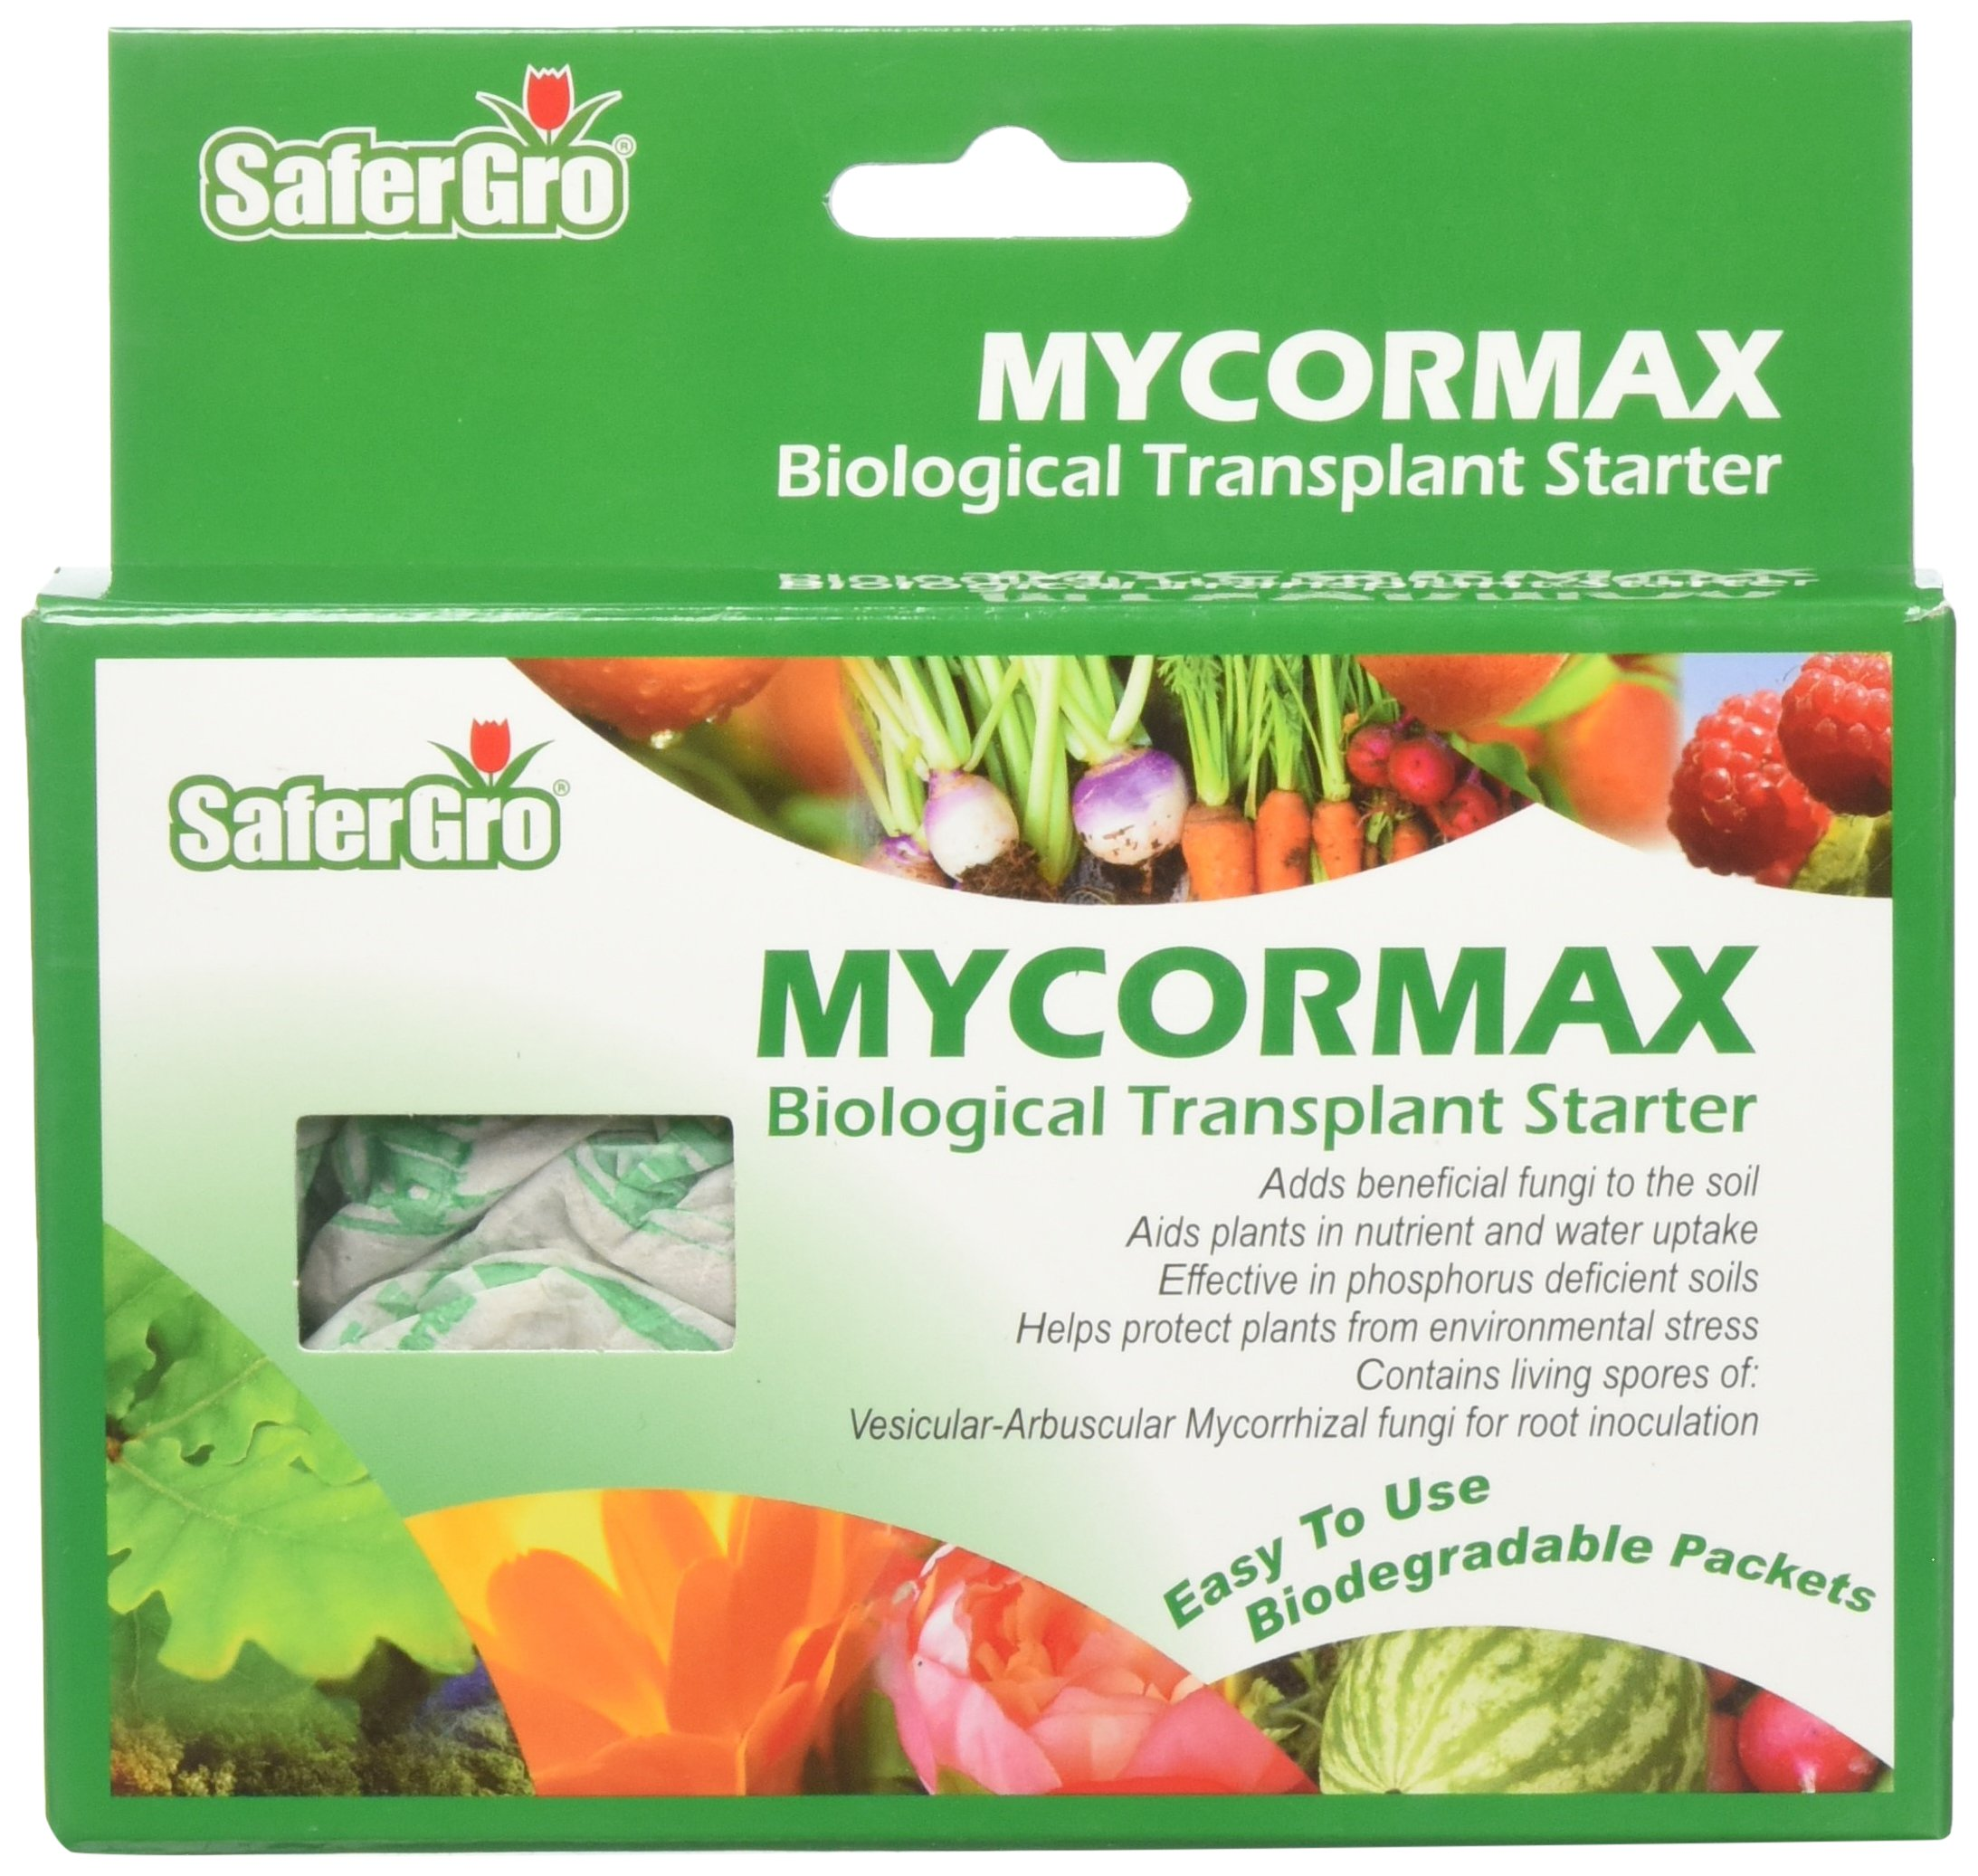 Mycormax Biological Transplant Starter, 0.5 lb (24 packets)